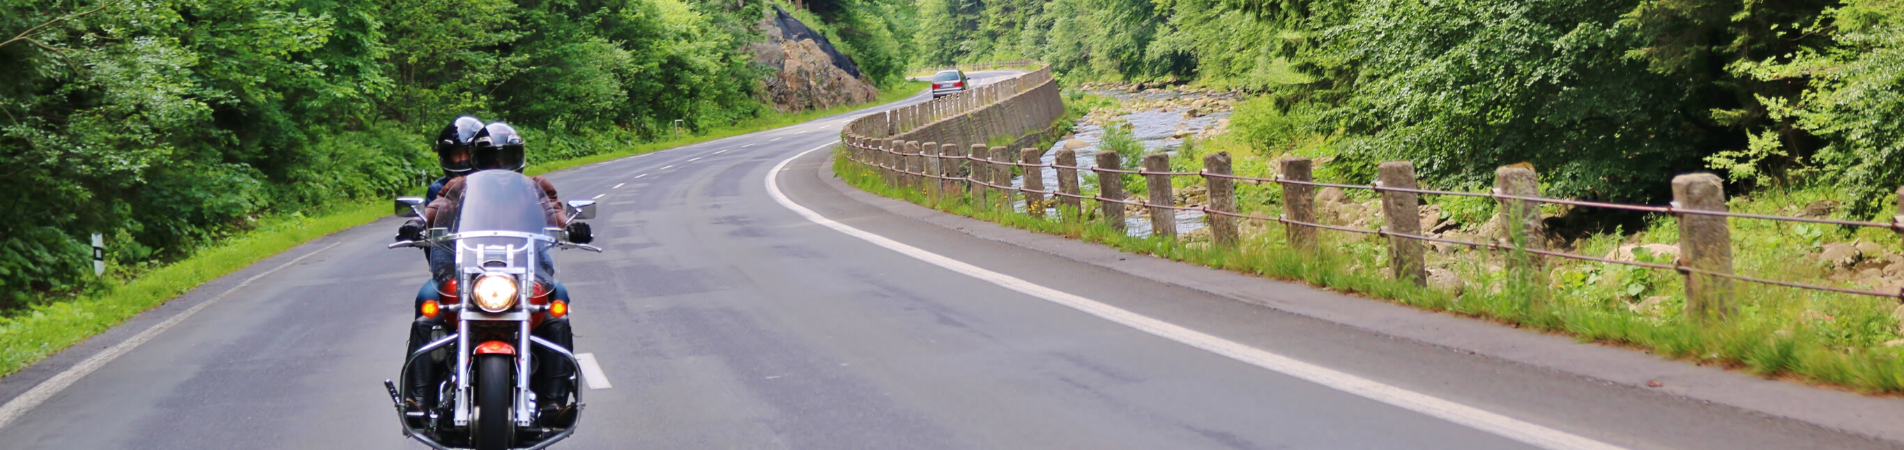 Motorradreisen Motorradverleih Reisewelt